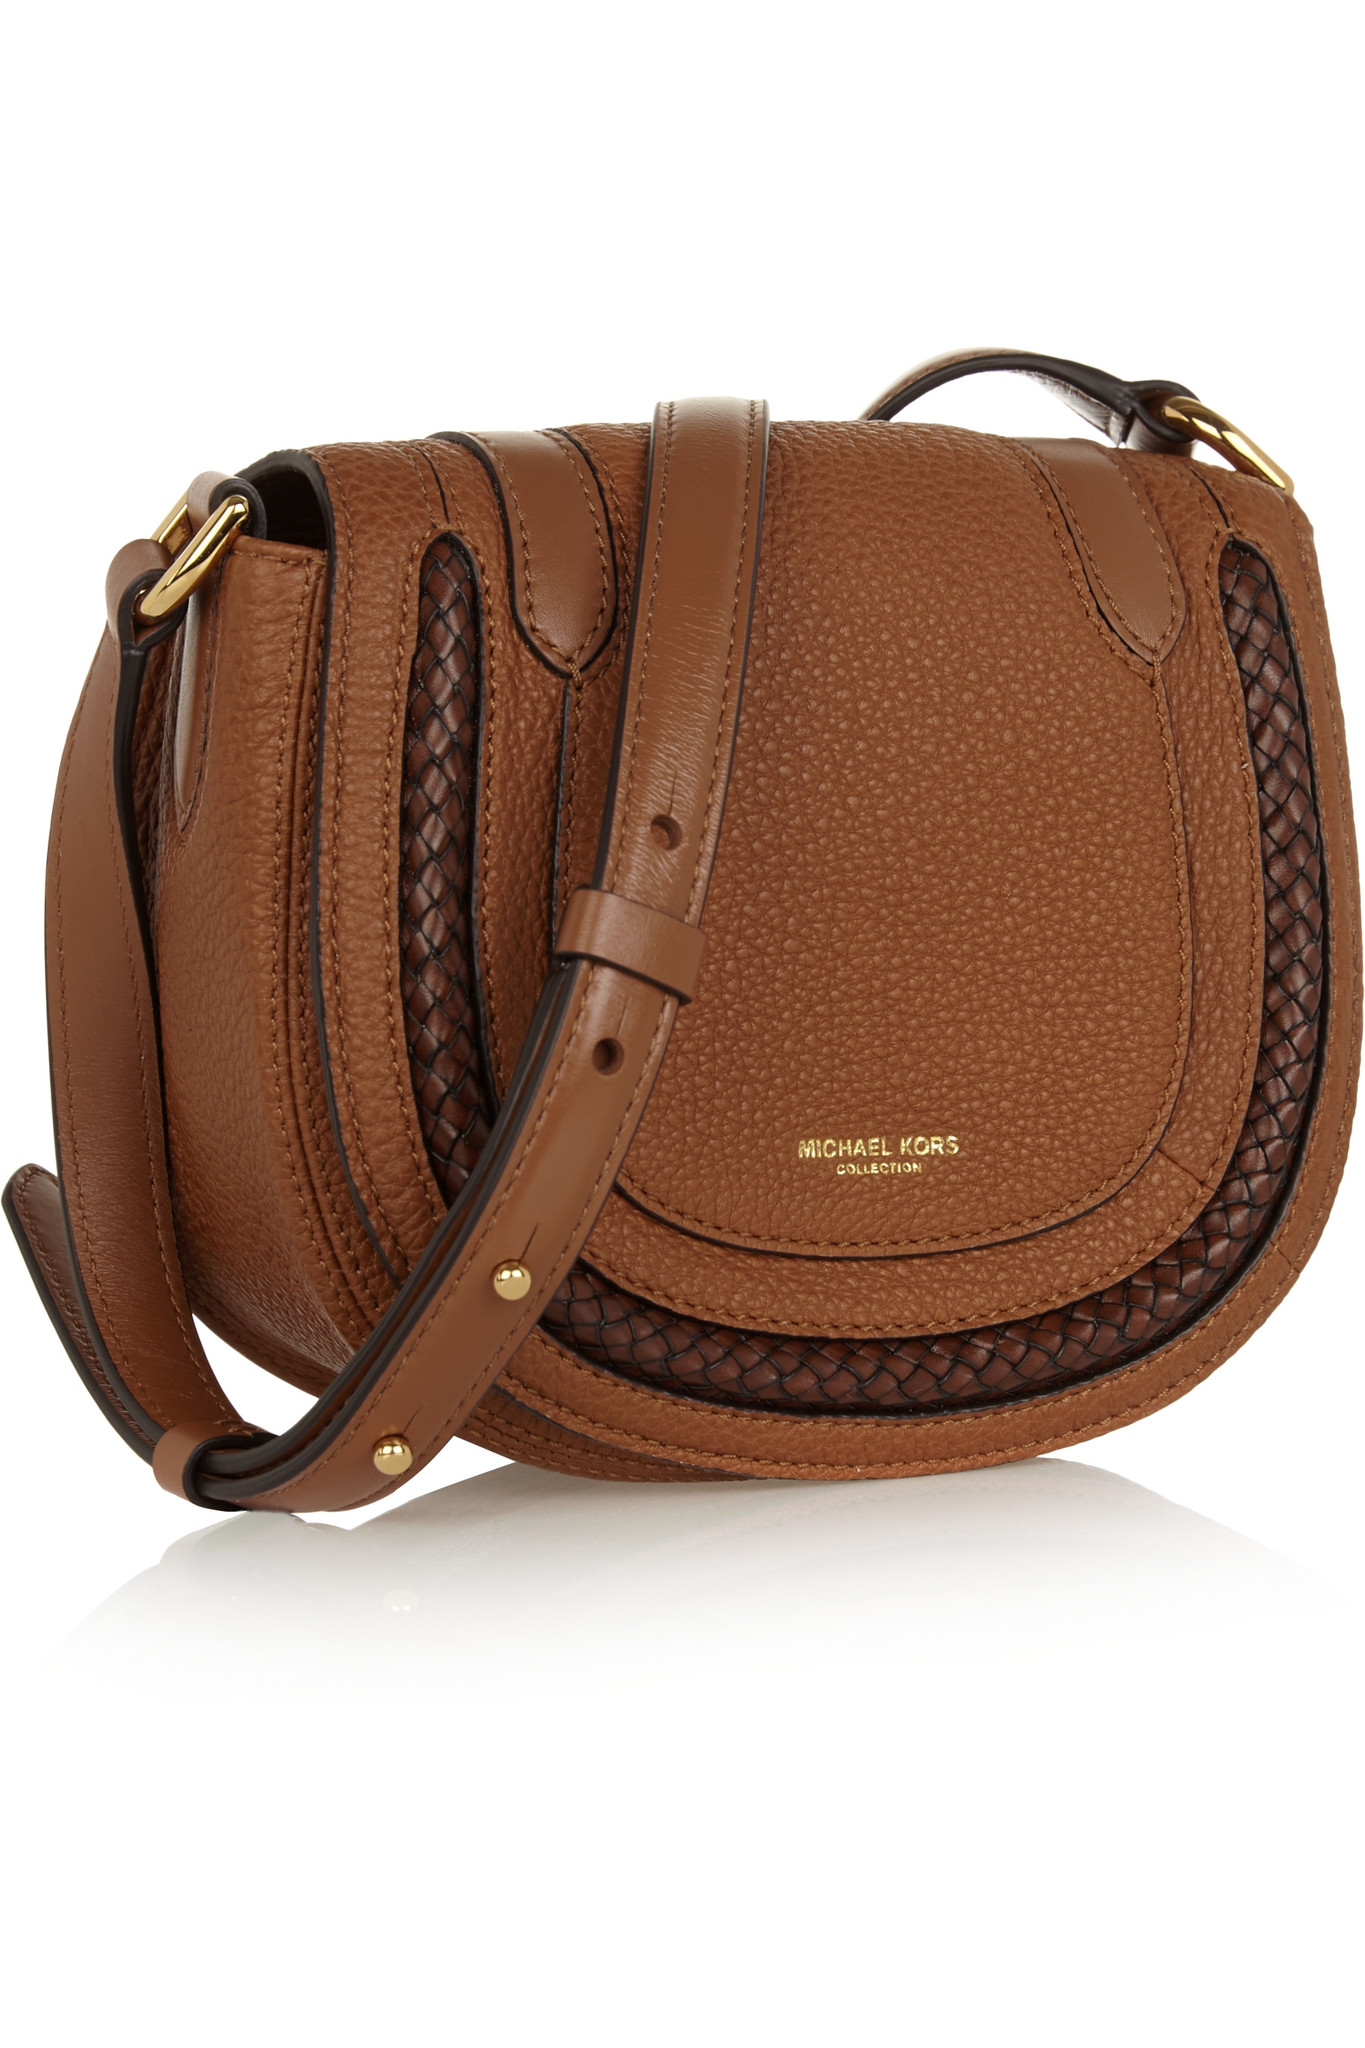 b63ddb7cfd46 Lyst - Michael Kors Skorpios Small Textured-leather Shoulder Bag